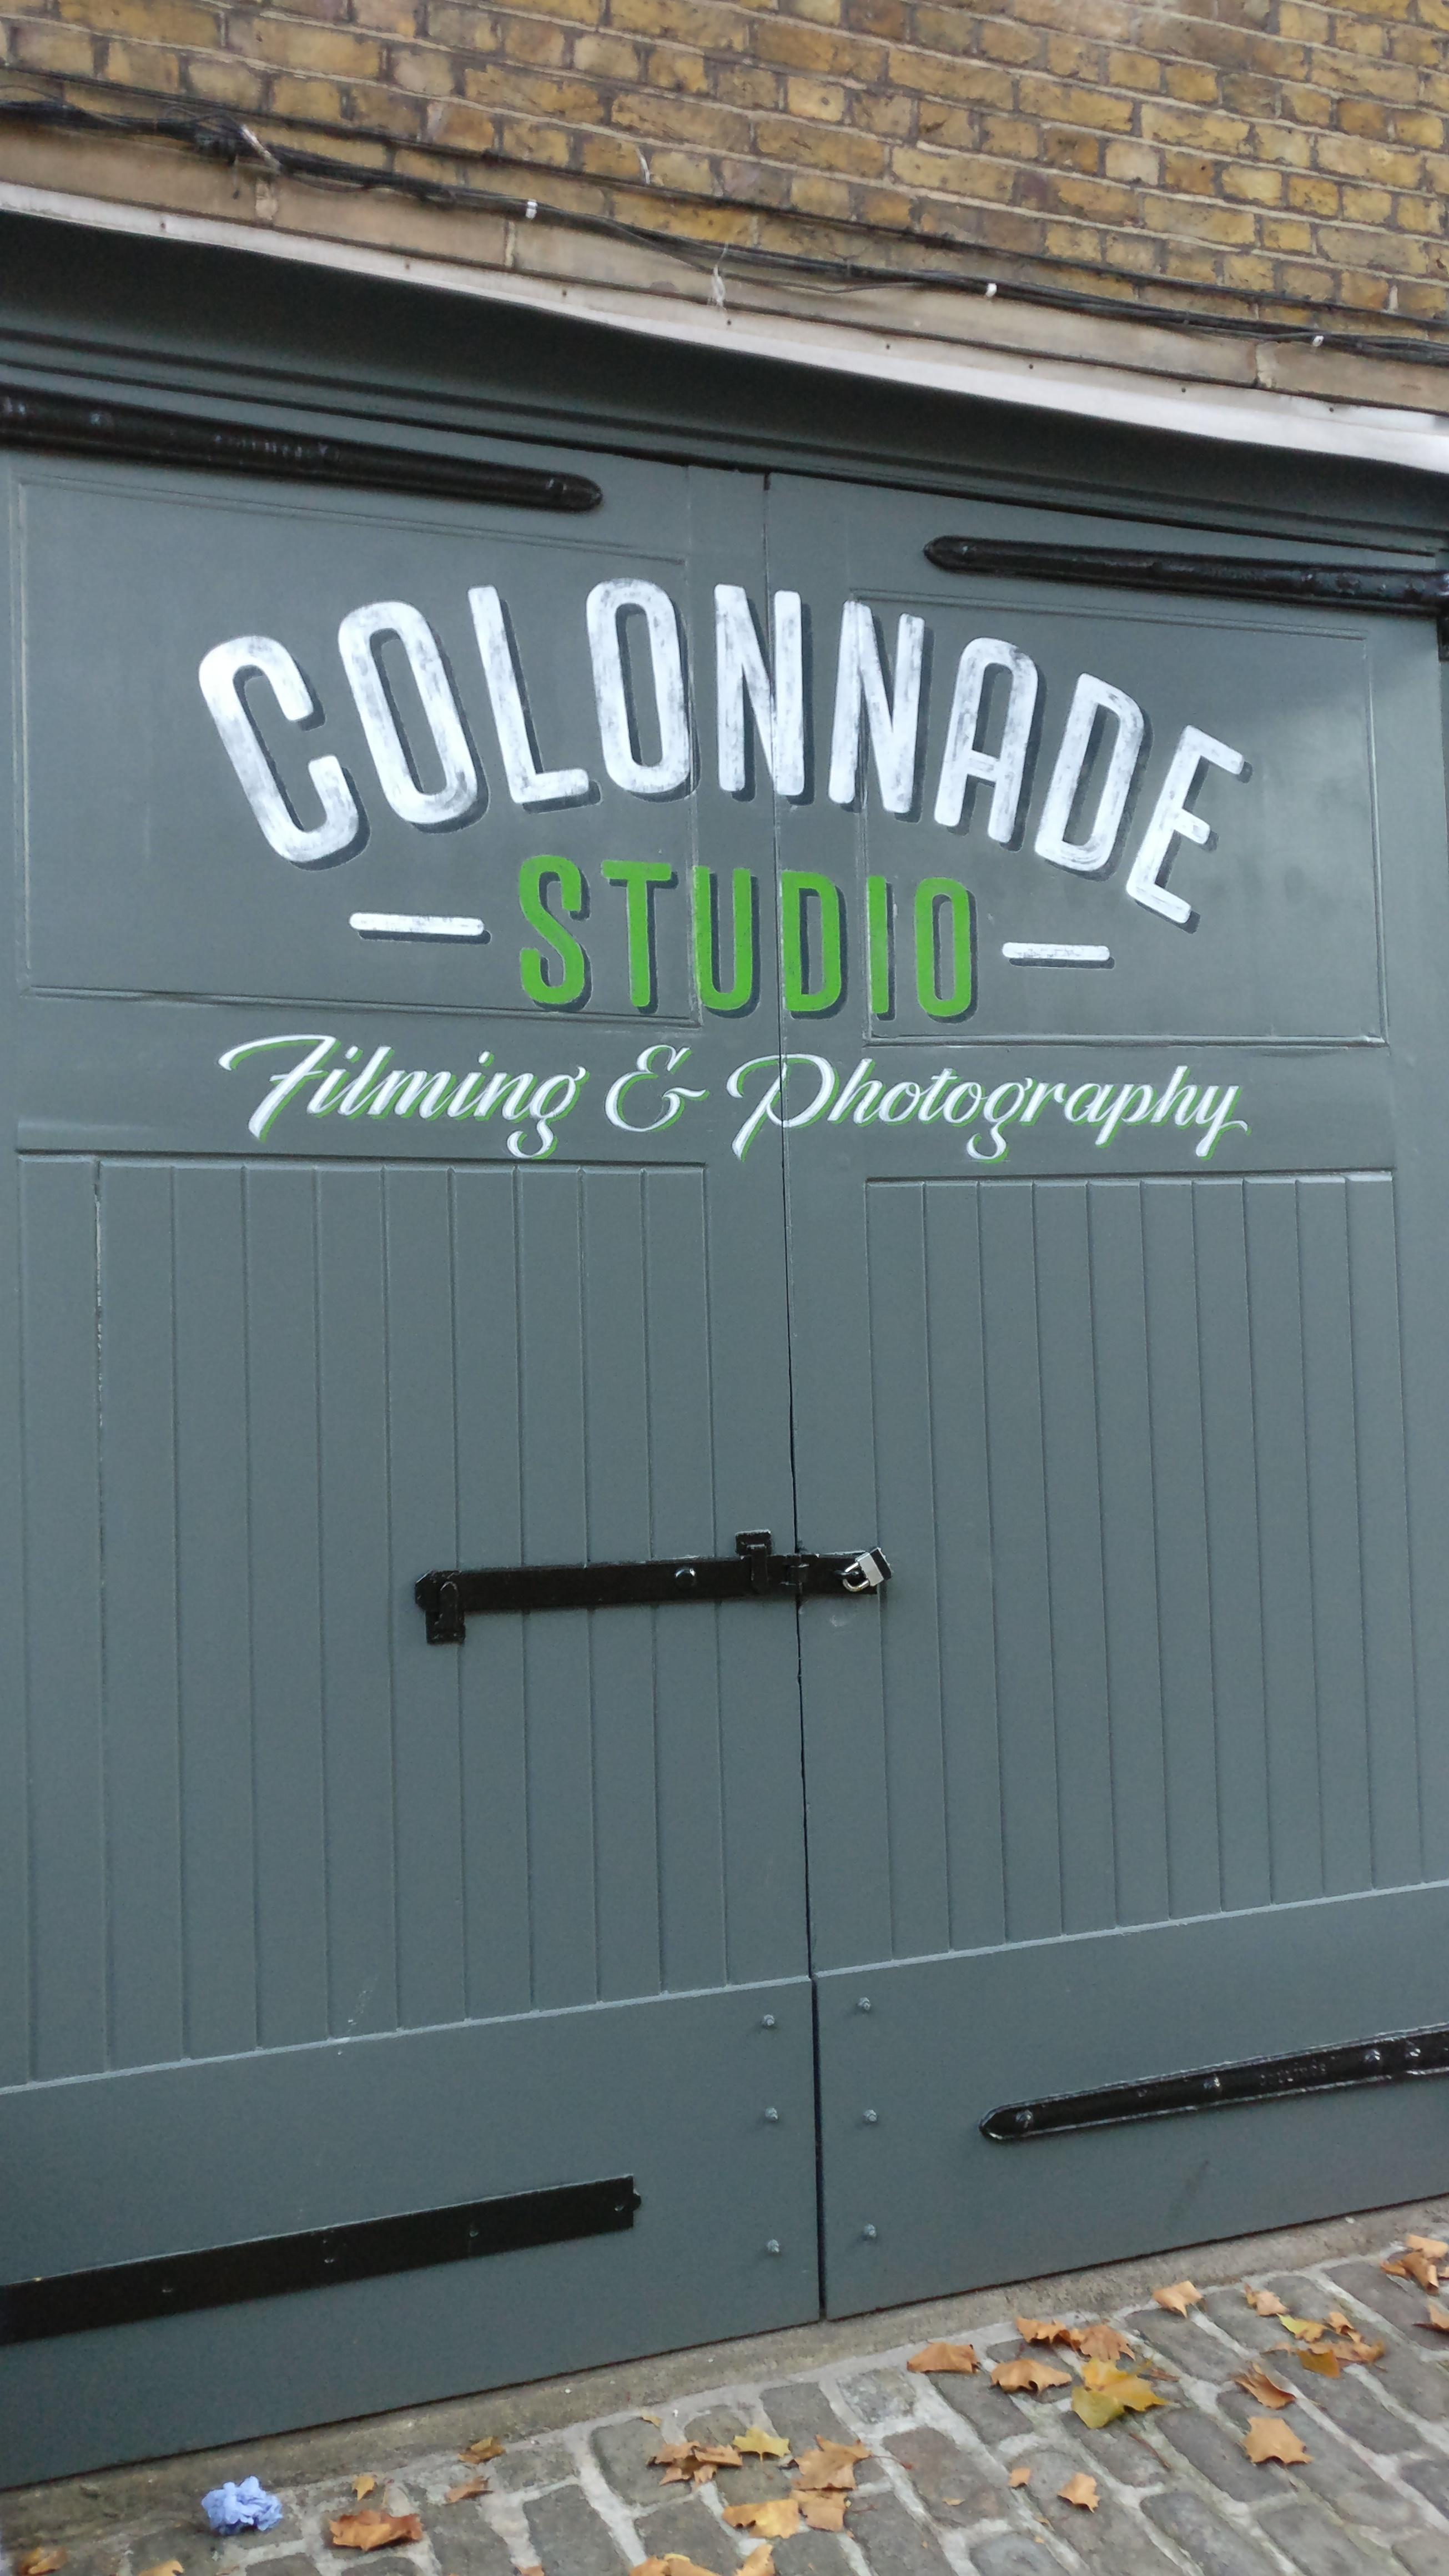 Colonnade Studio, Bloomsbury